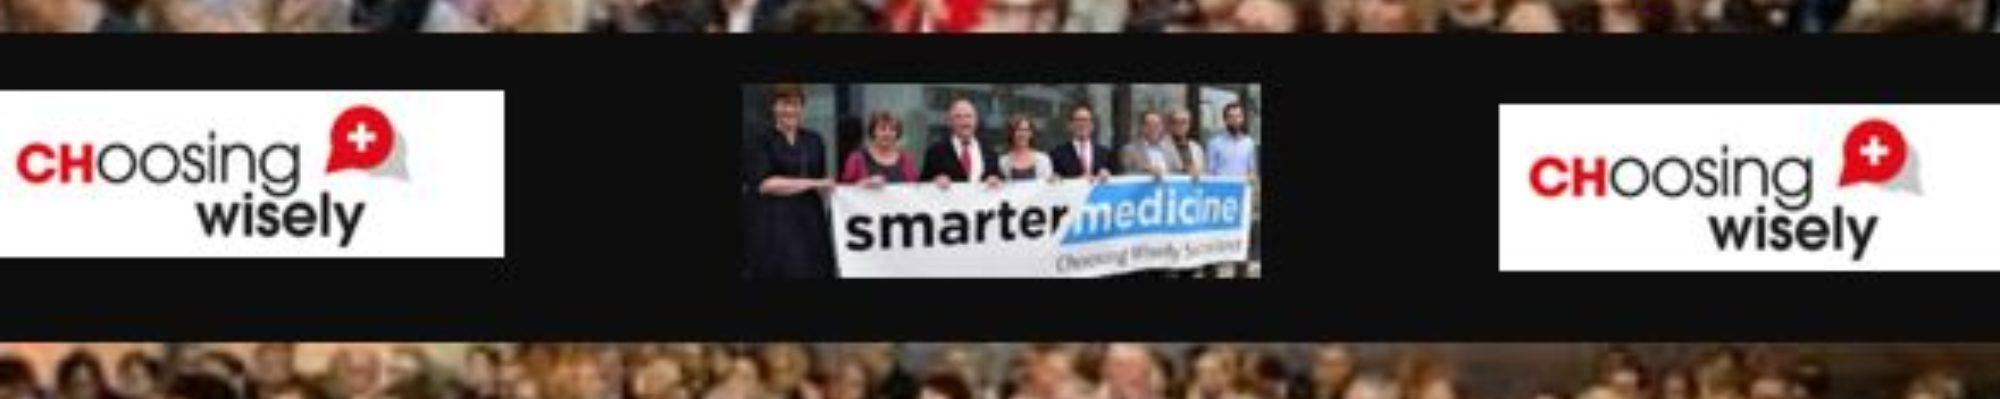 Smarter medicine